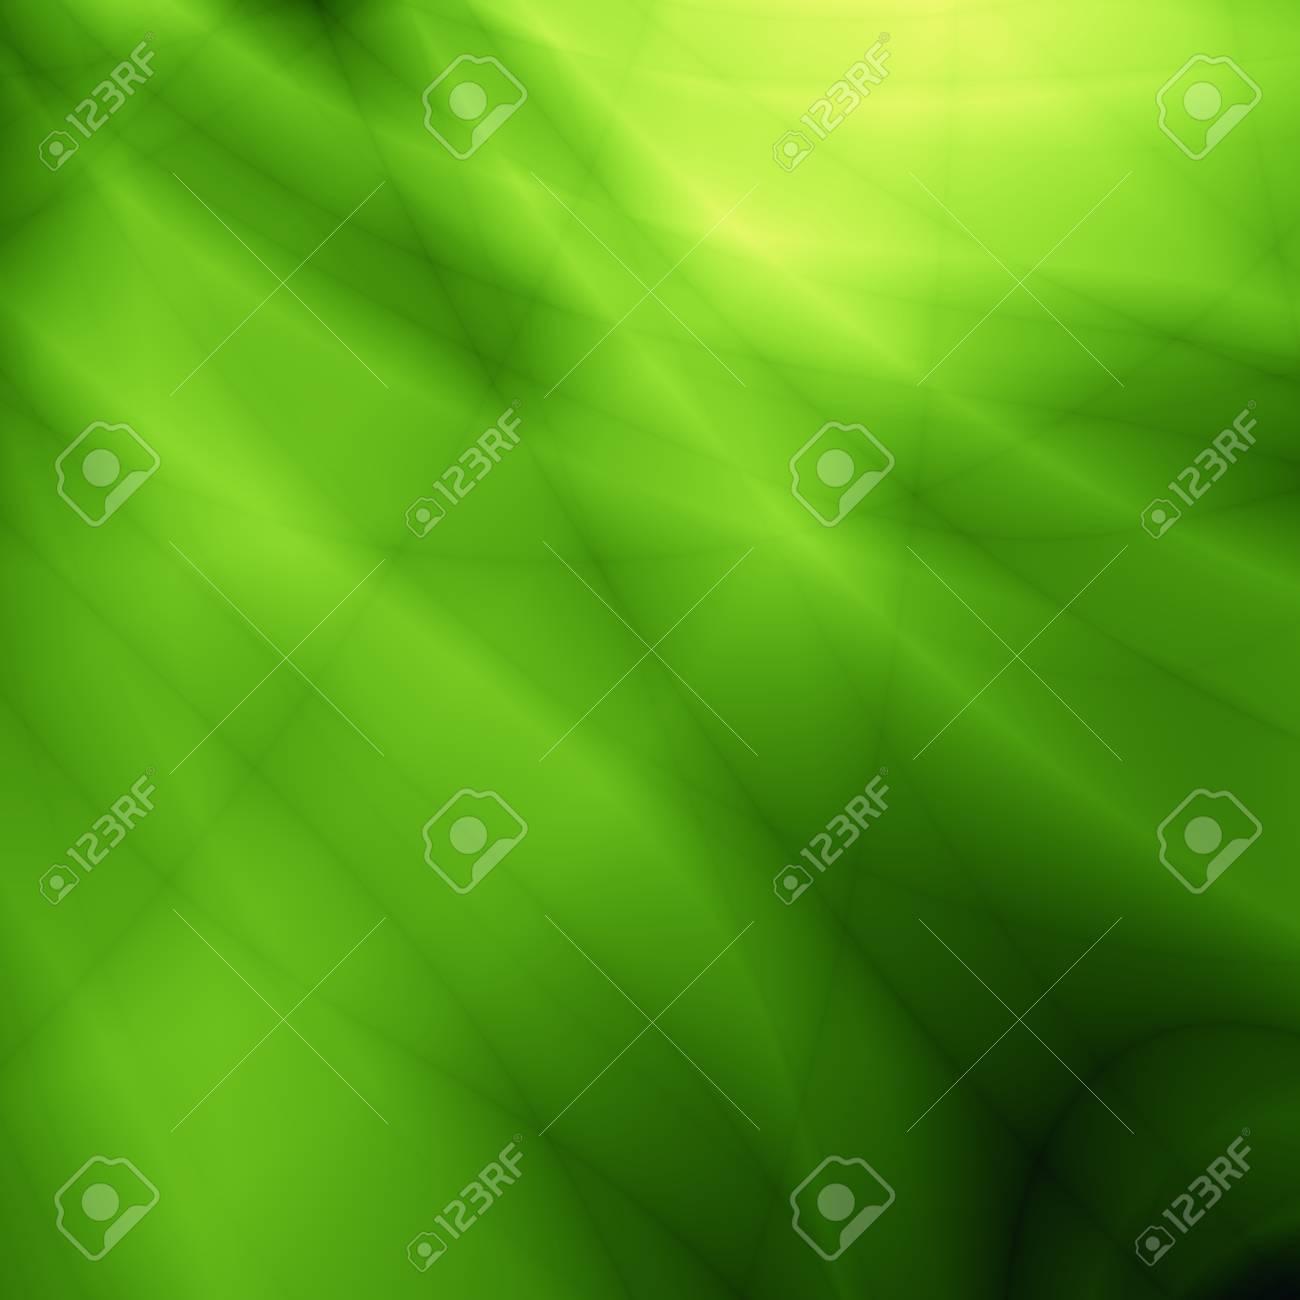 64889836 hellgr%C3%BCne tapete modernes gras eco hintergrund - Hellgrune Tapete